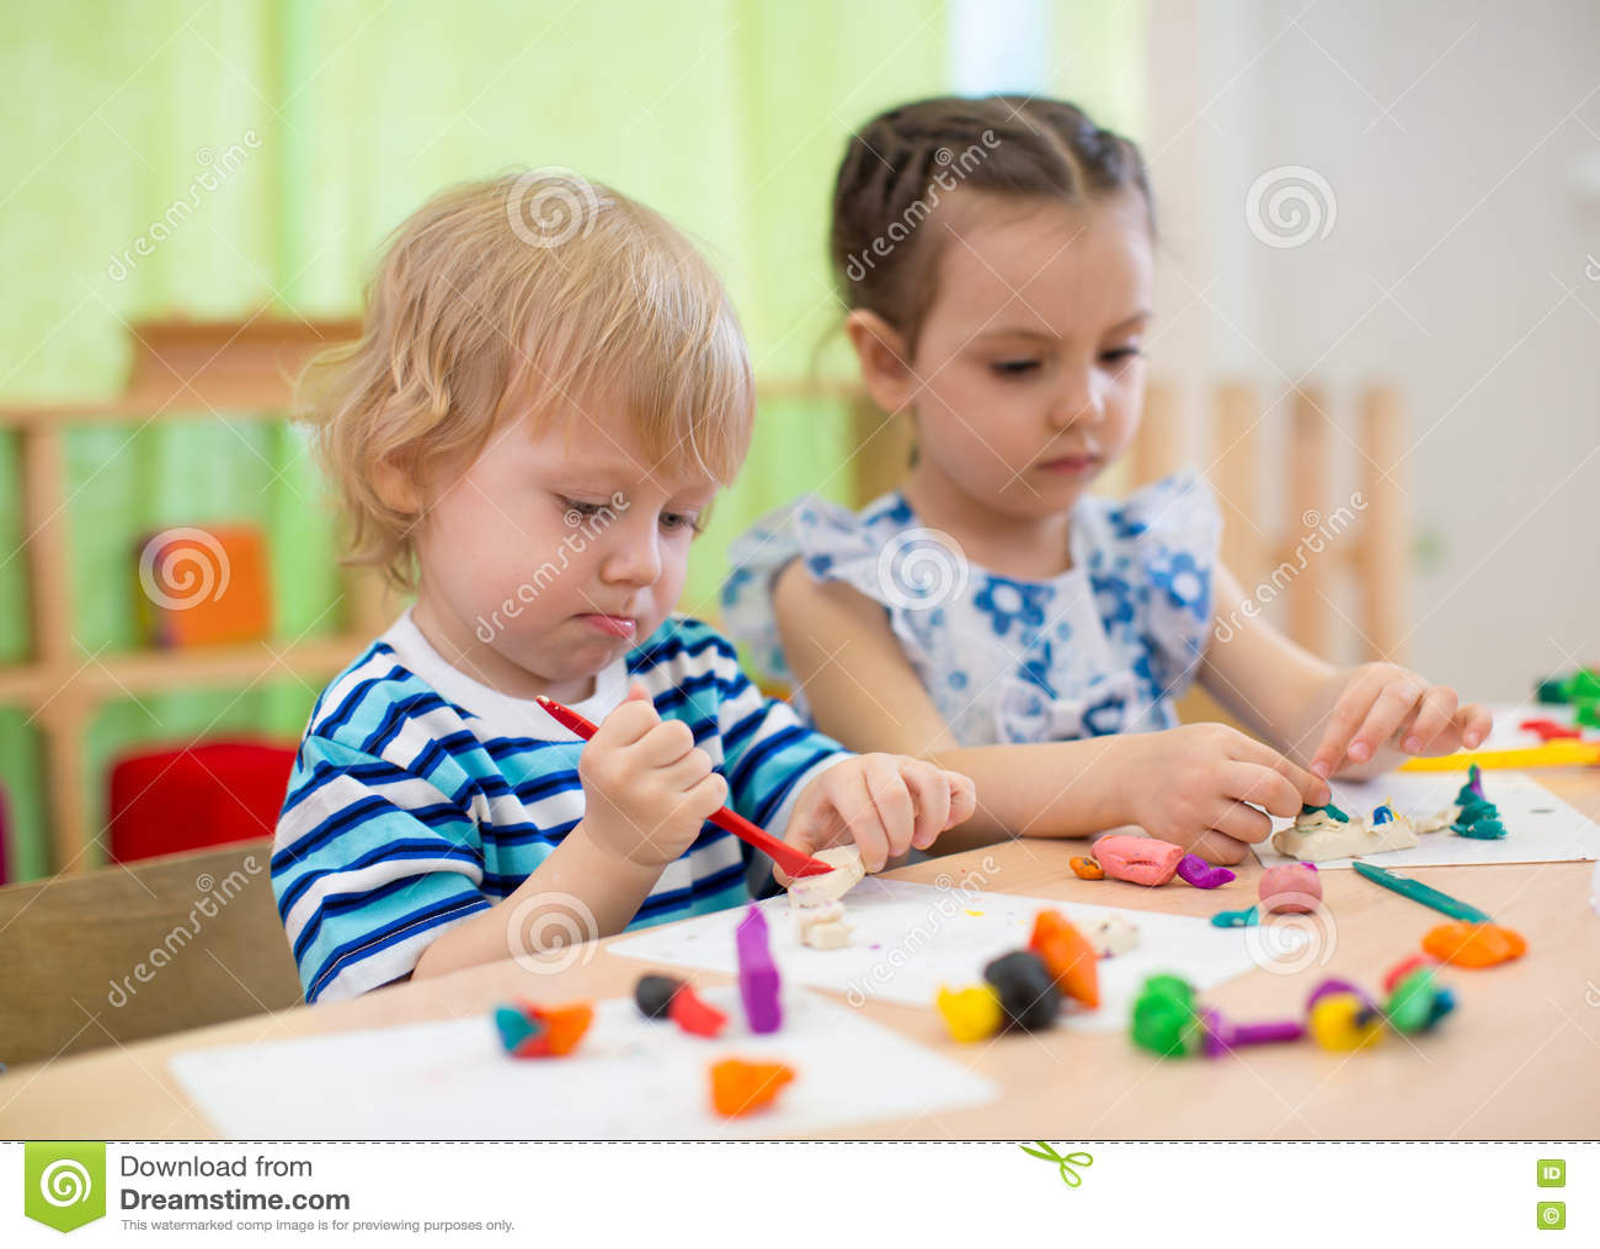 Download Kids Or Children Creating Arts And Crafts In Kindergarten Stock Image